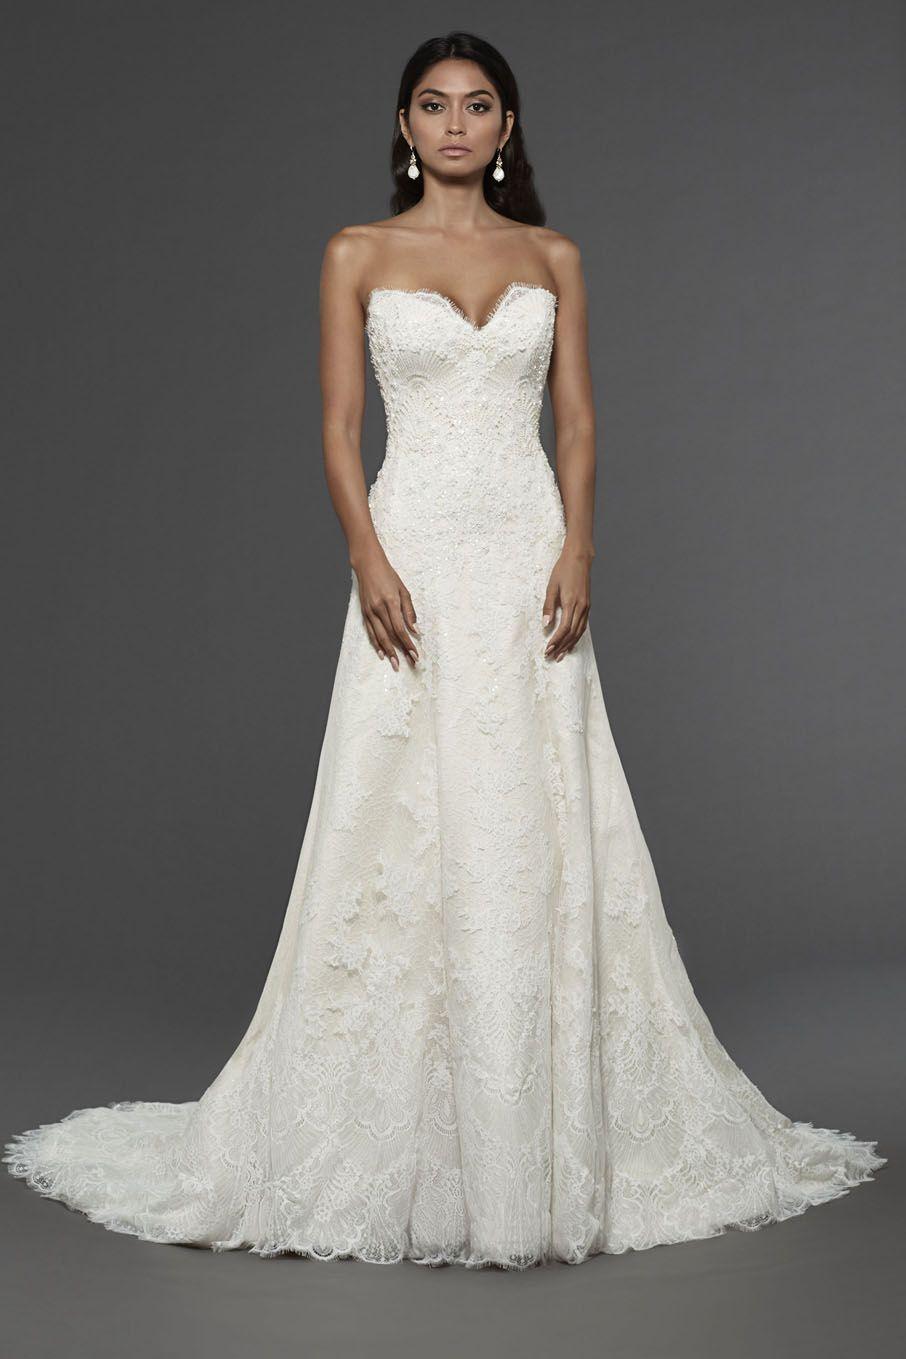 Atlanta wedding dress shops  Pin by Rochelle Chezick on Future Wedding  Pinterest  Matthew